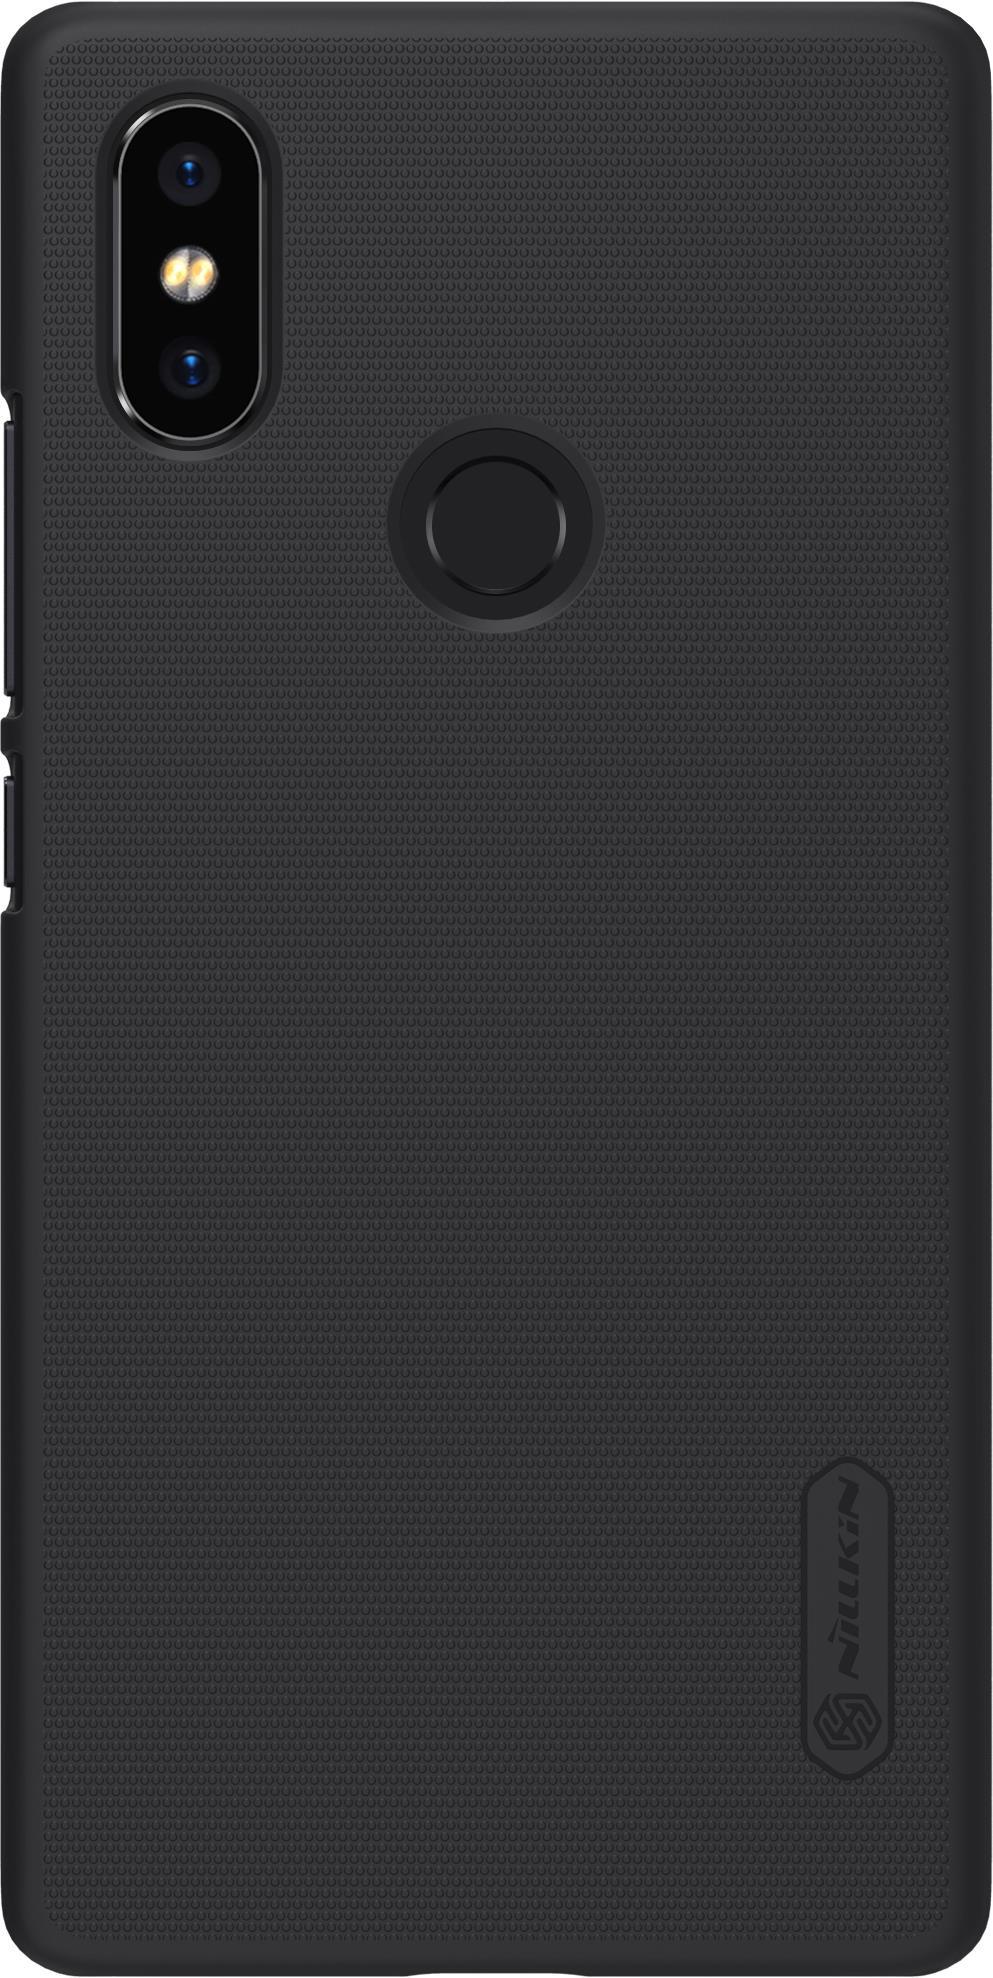 Накладка Nillkin Super Frosted для Xiaomi Mi 8 SE, 6902048159778, черный